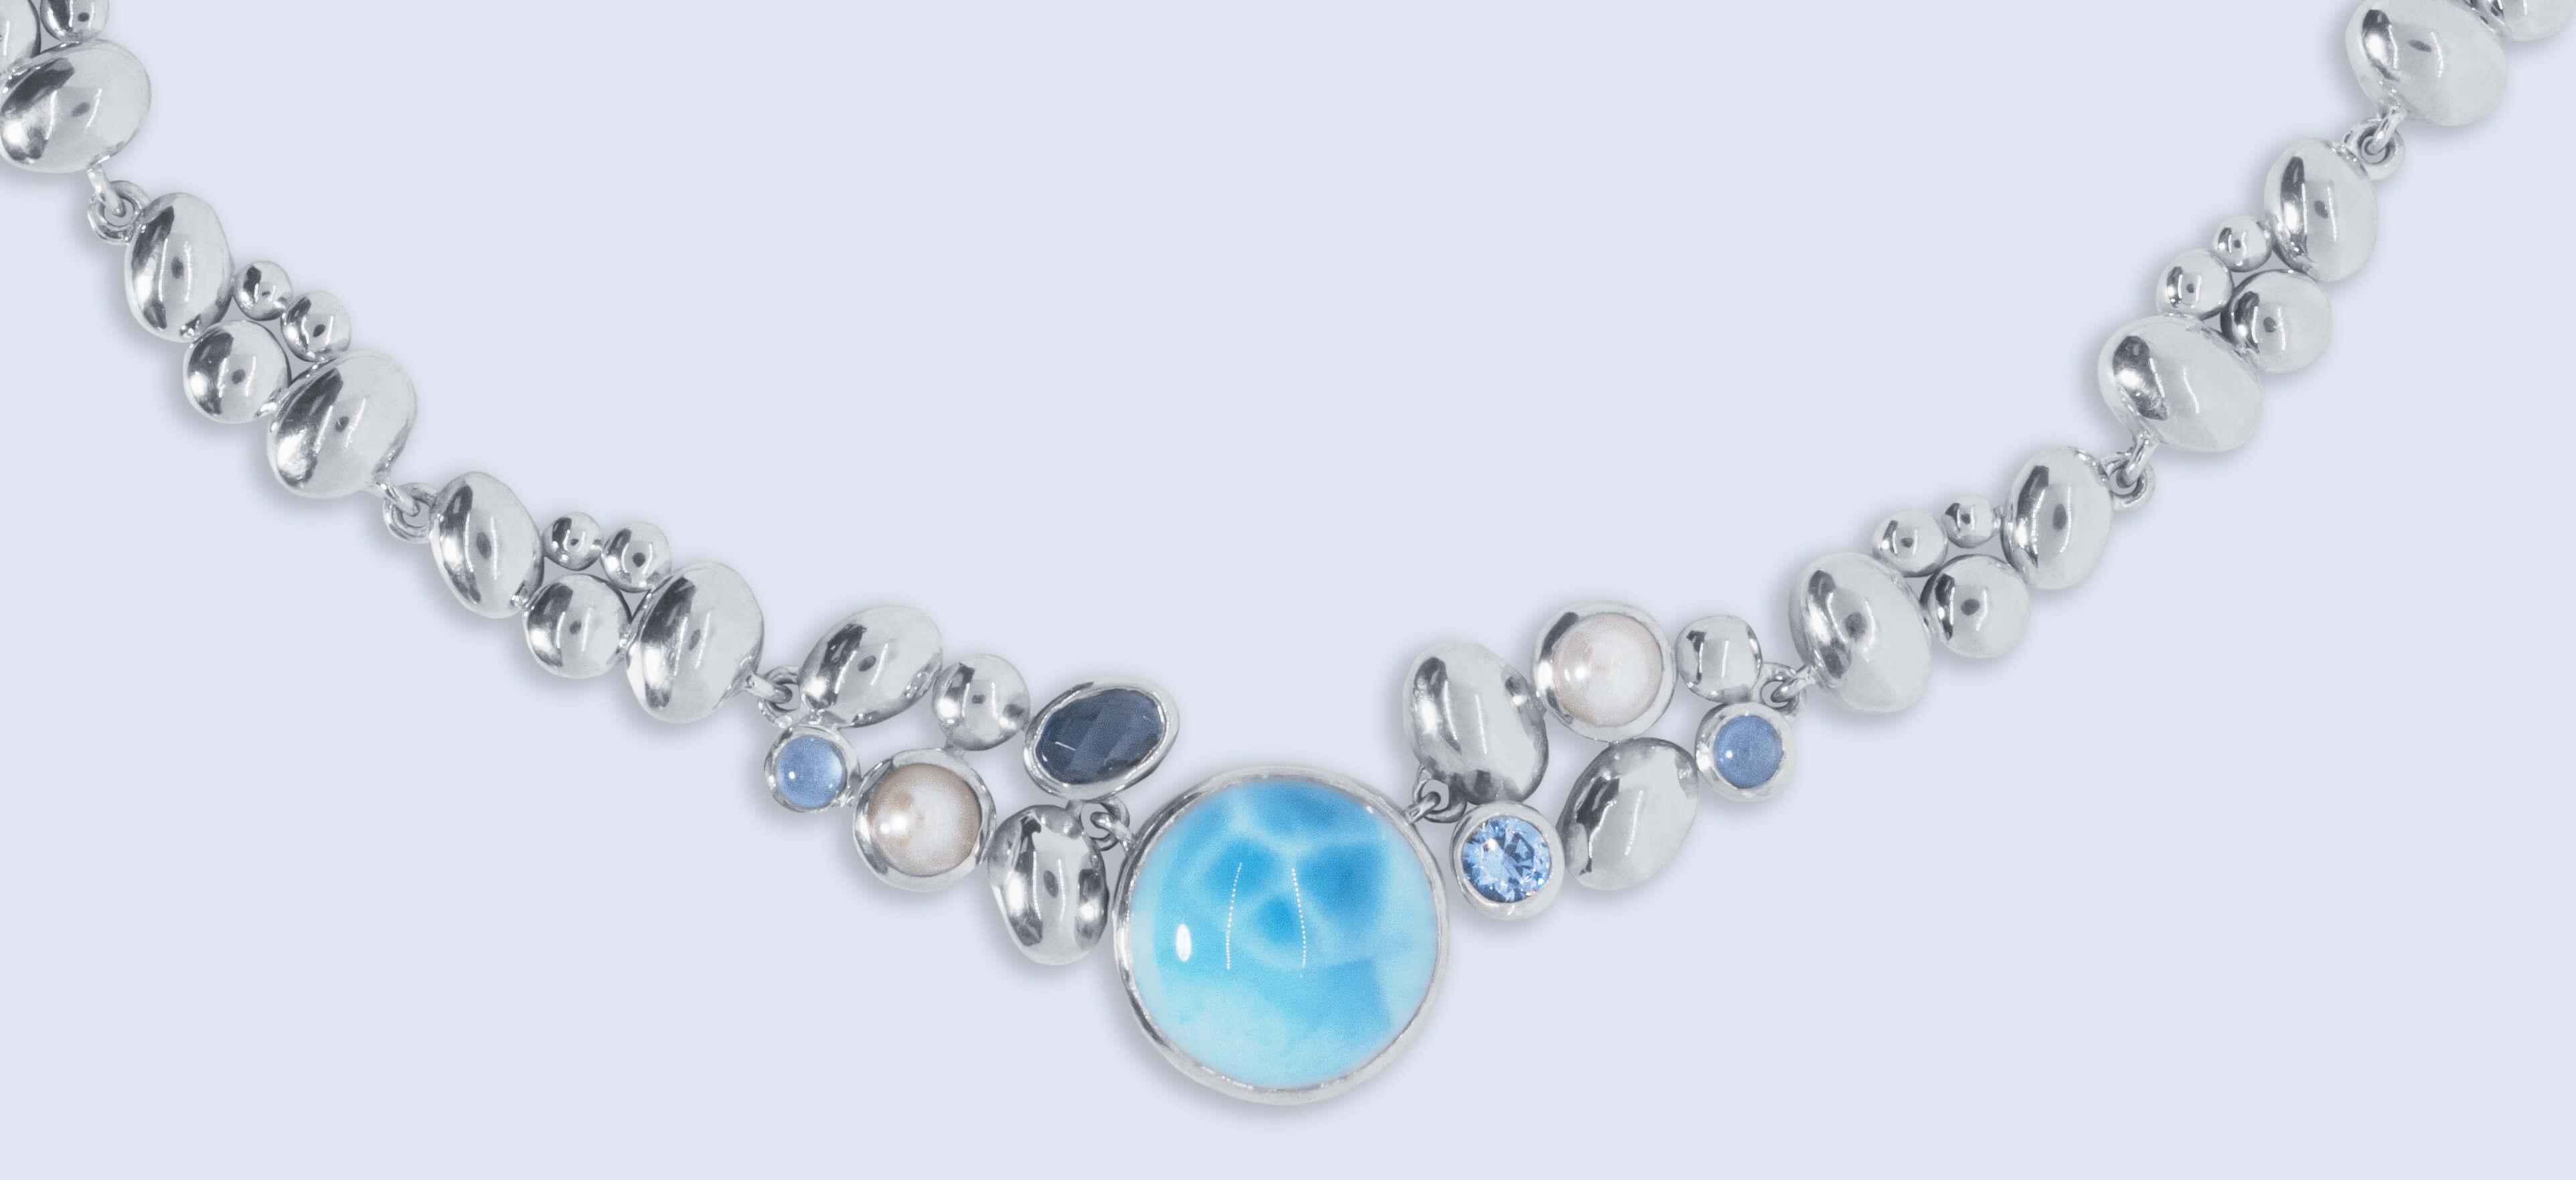 Clean sterling silver larimar gemstone jewelry